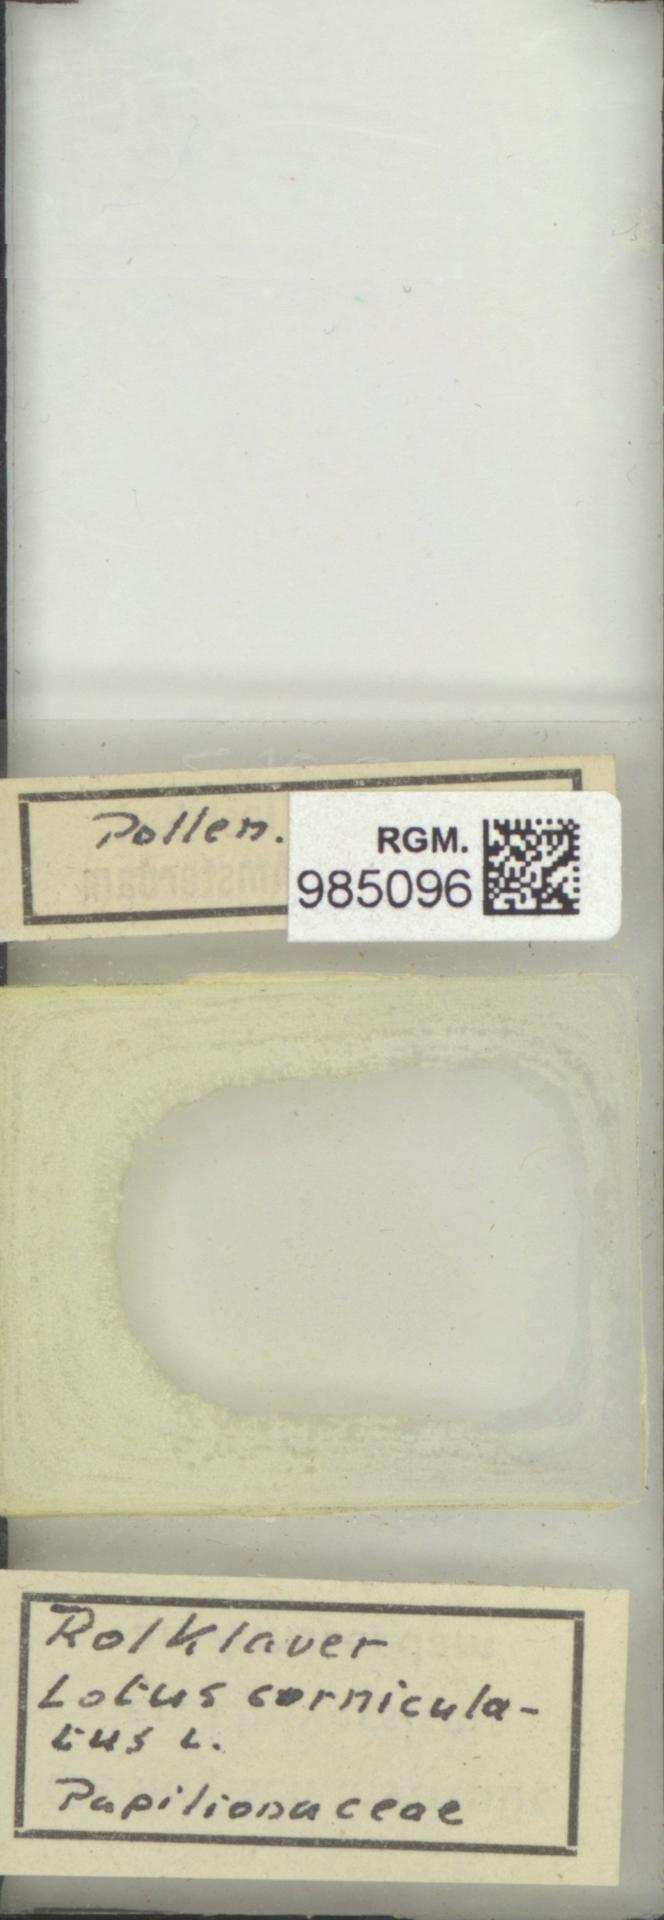 RGM.985096 | Lotus corniculatus L.